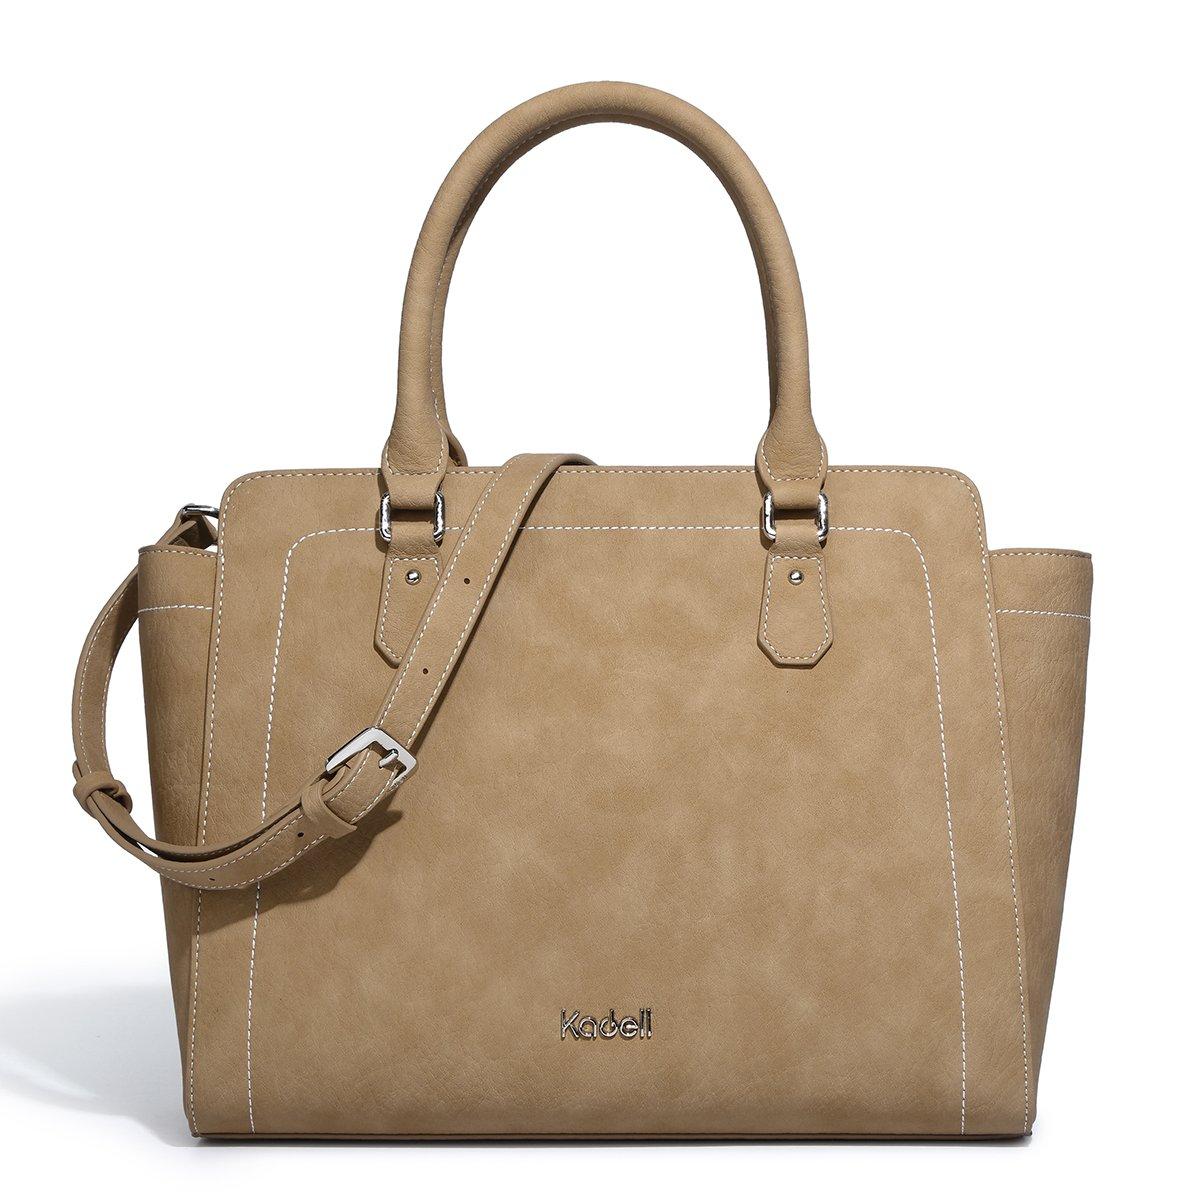 Kadell 2018 New Women Soft Top Handle Satchel Handbags Shoulder Bag Tote Purse Messenger Bags with Zipper Brown